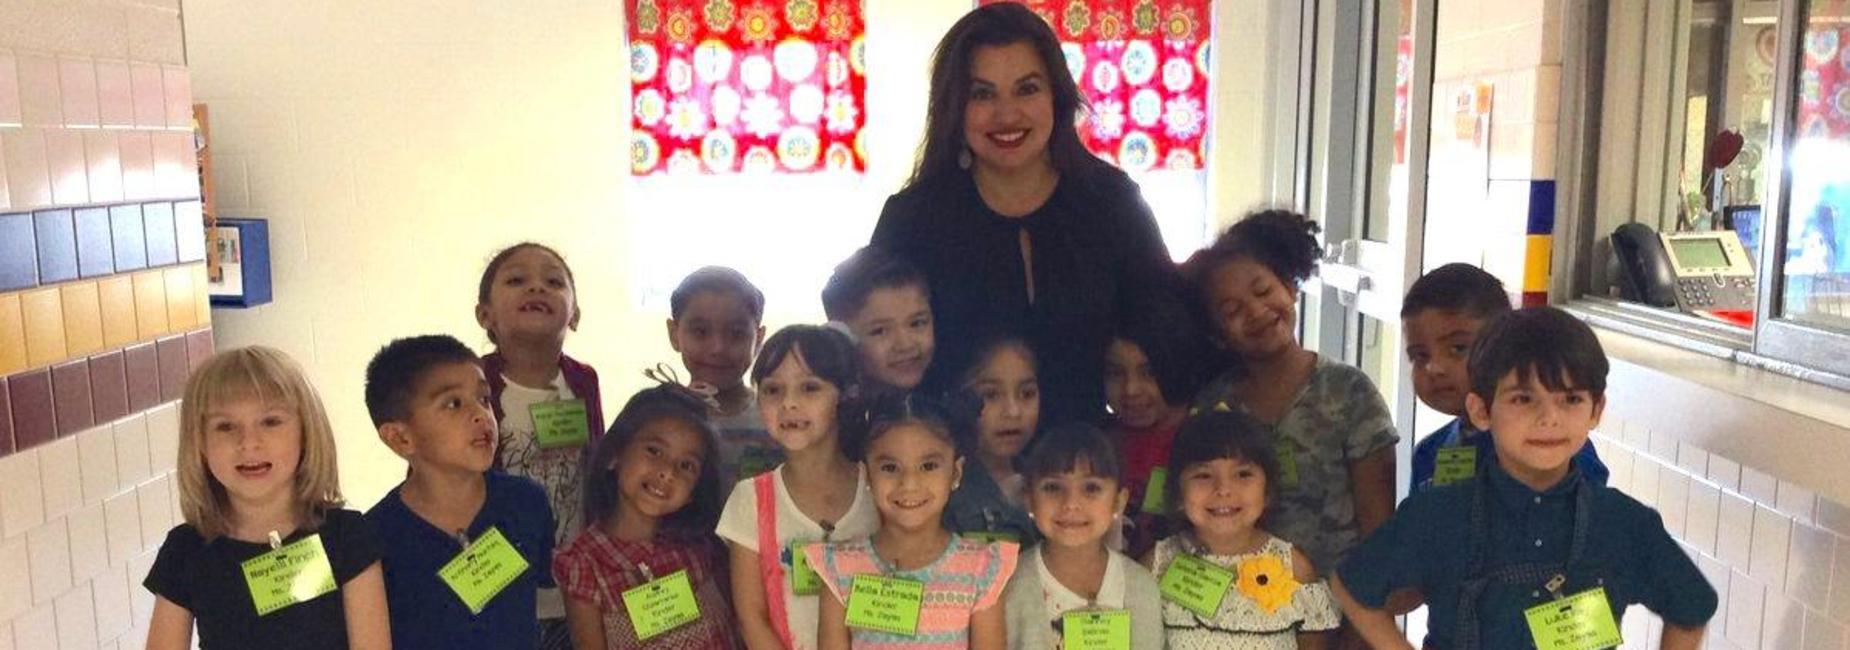 Kindergarteners meeting Ms. Garza